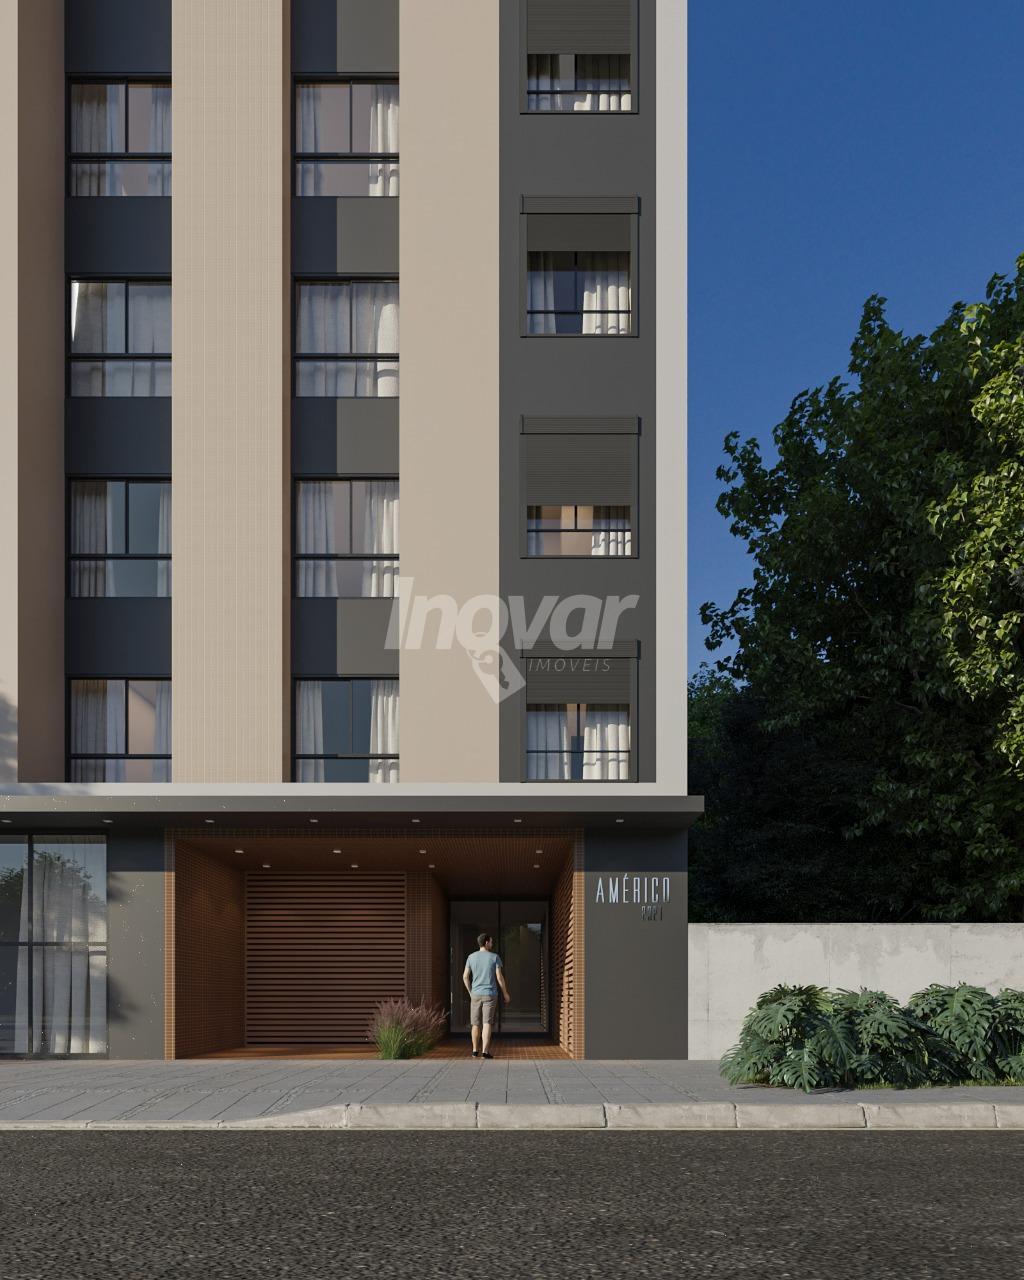 Apartamento com 2 dormitórios à venda,115.00m², Jardim La Salle, TOLEDO - PR